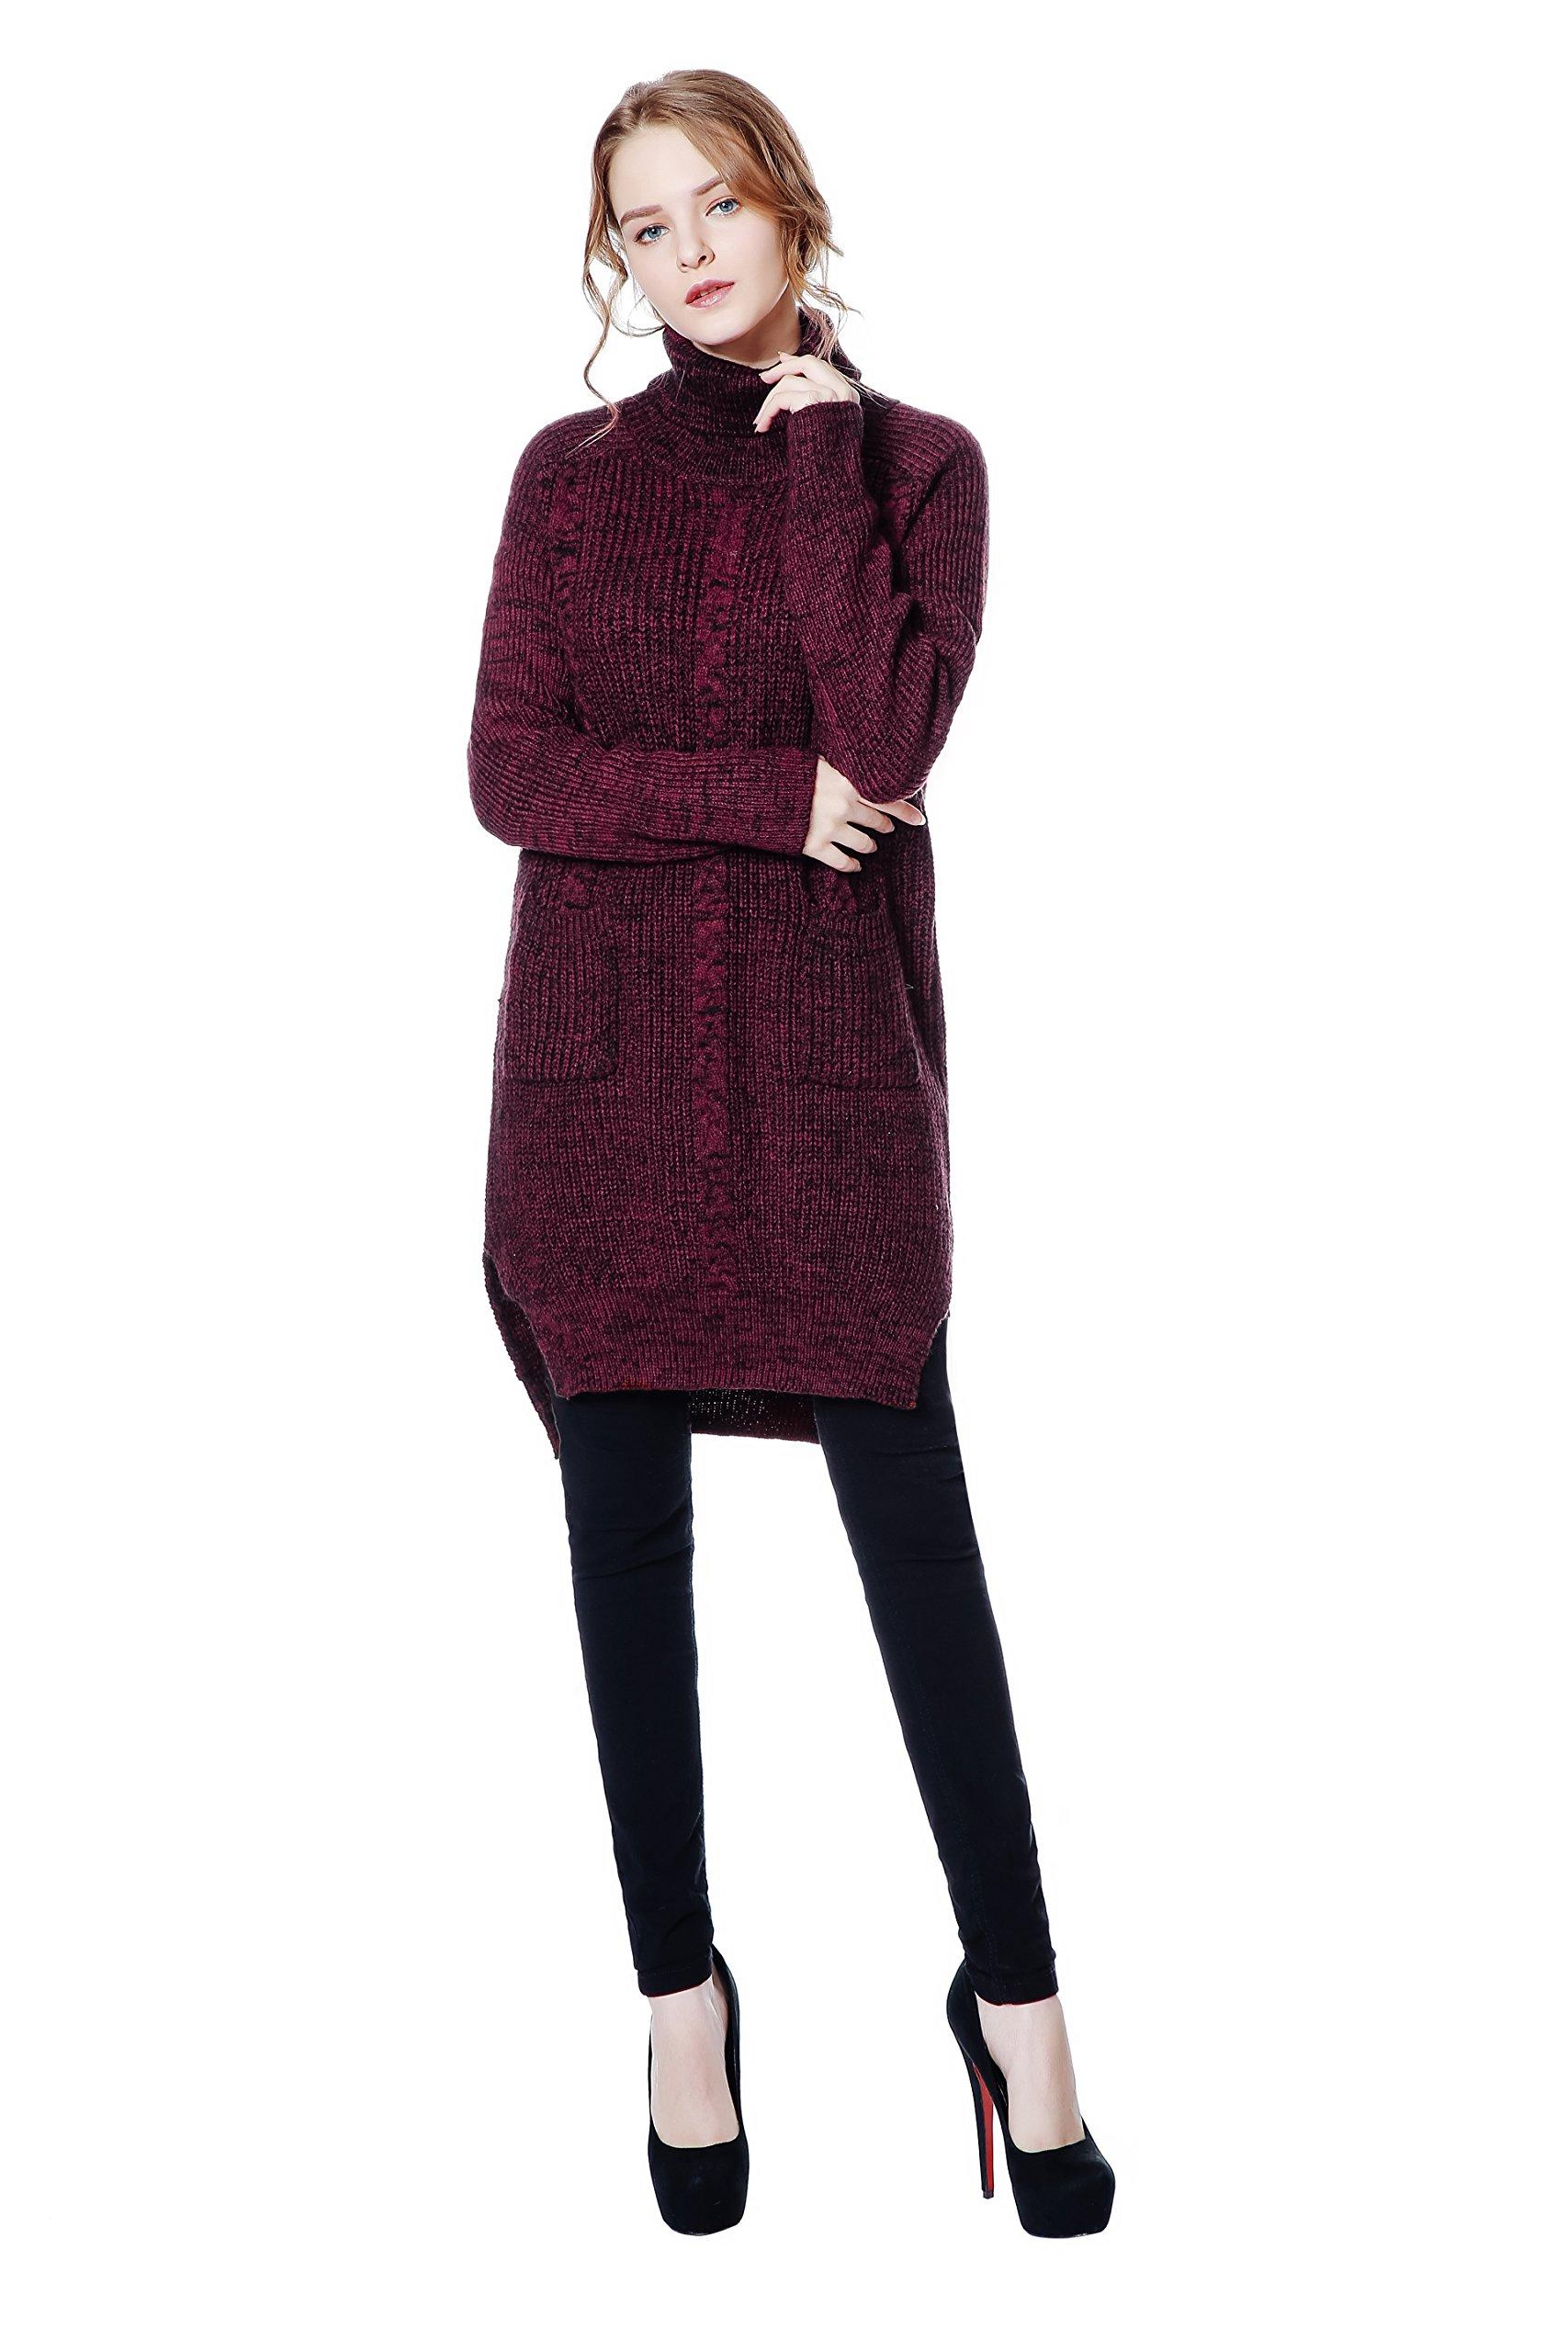 Metme Women's Classic Turtleneck Sweater Casual Style Knit Baggy Long Sleeve Knitwear Jumper